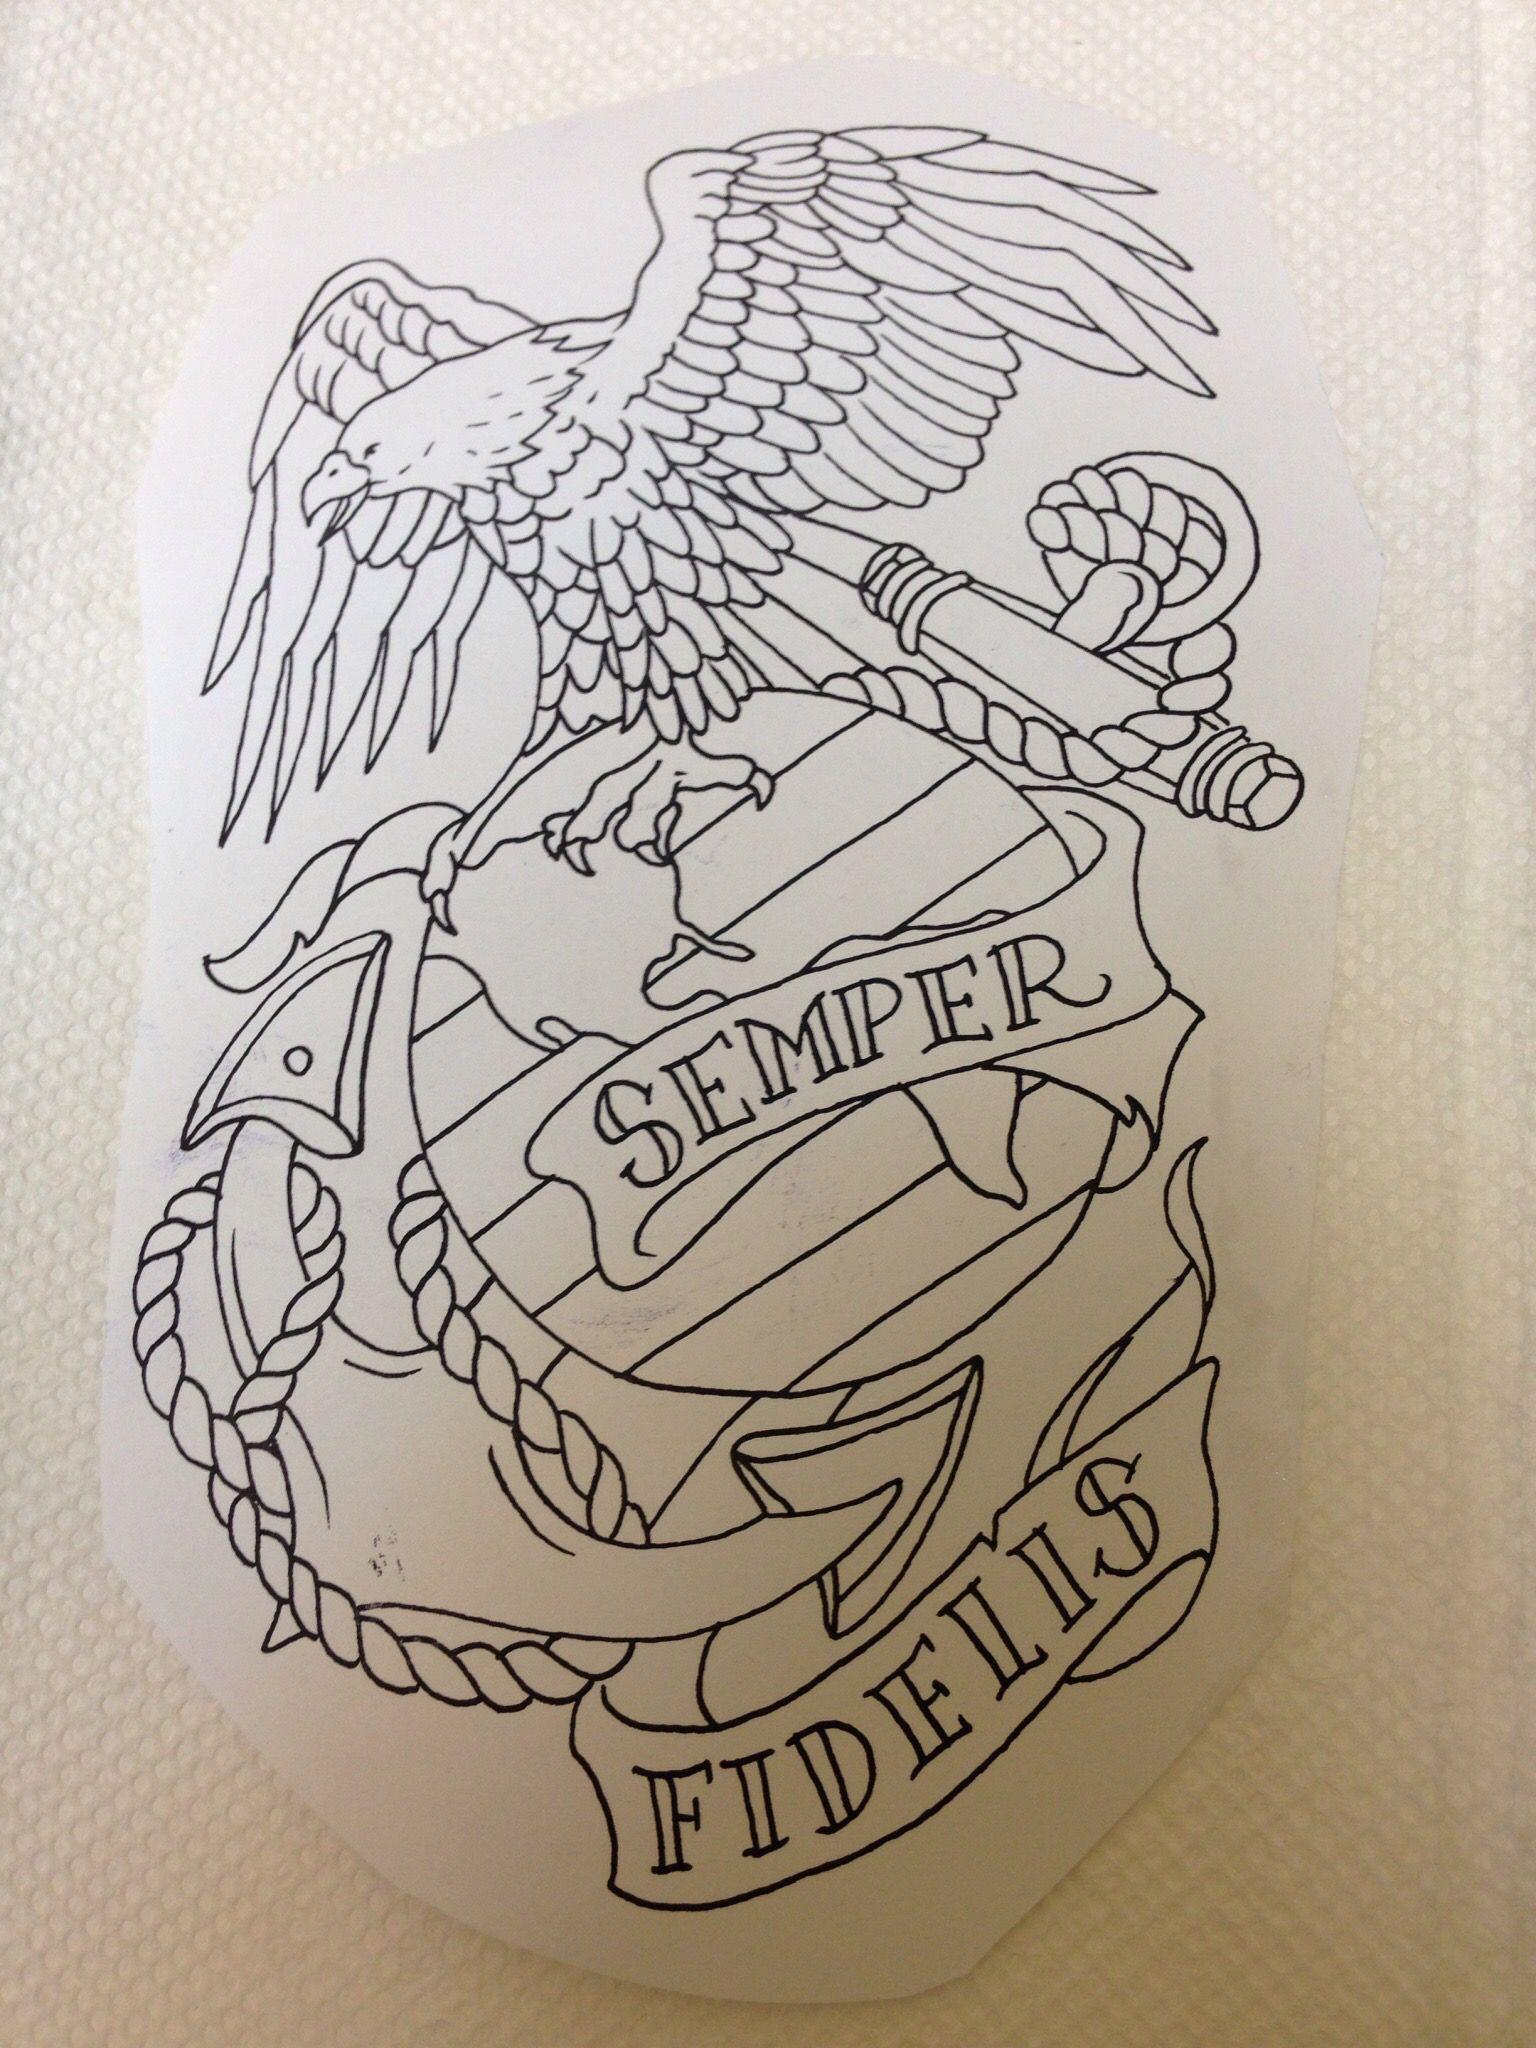 Fi fireman tattoo designs - Usmc Print Usmc Tattoosmarine Tattootatoossemper Fimarine